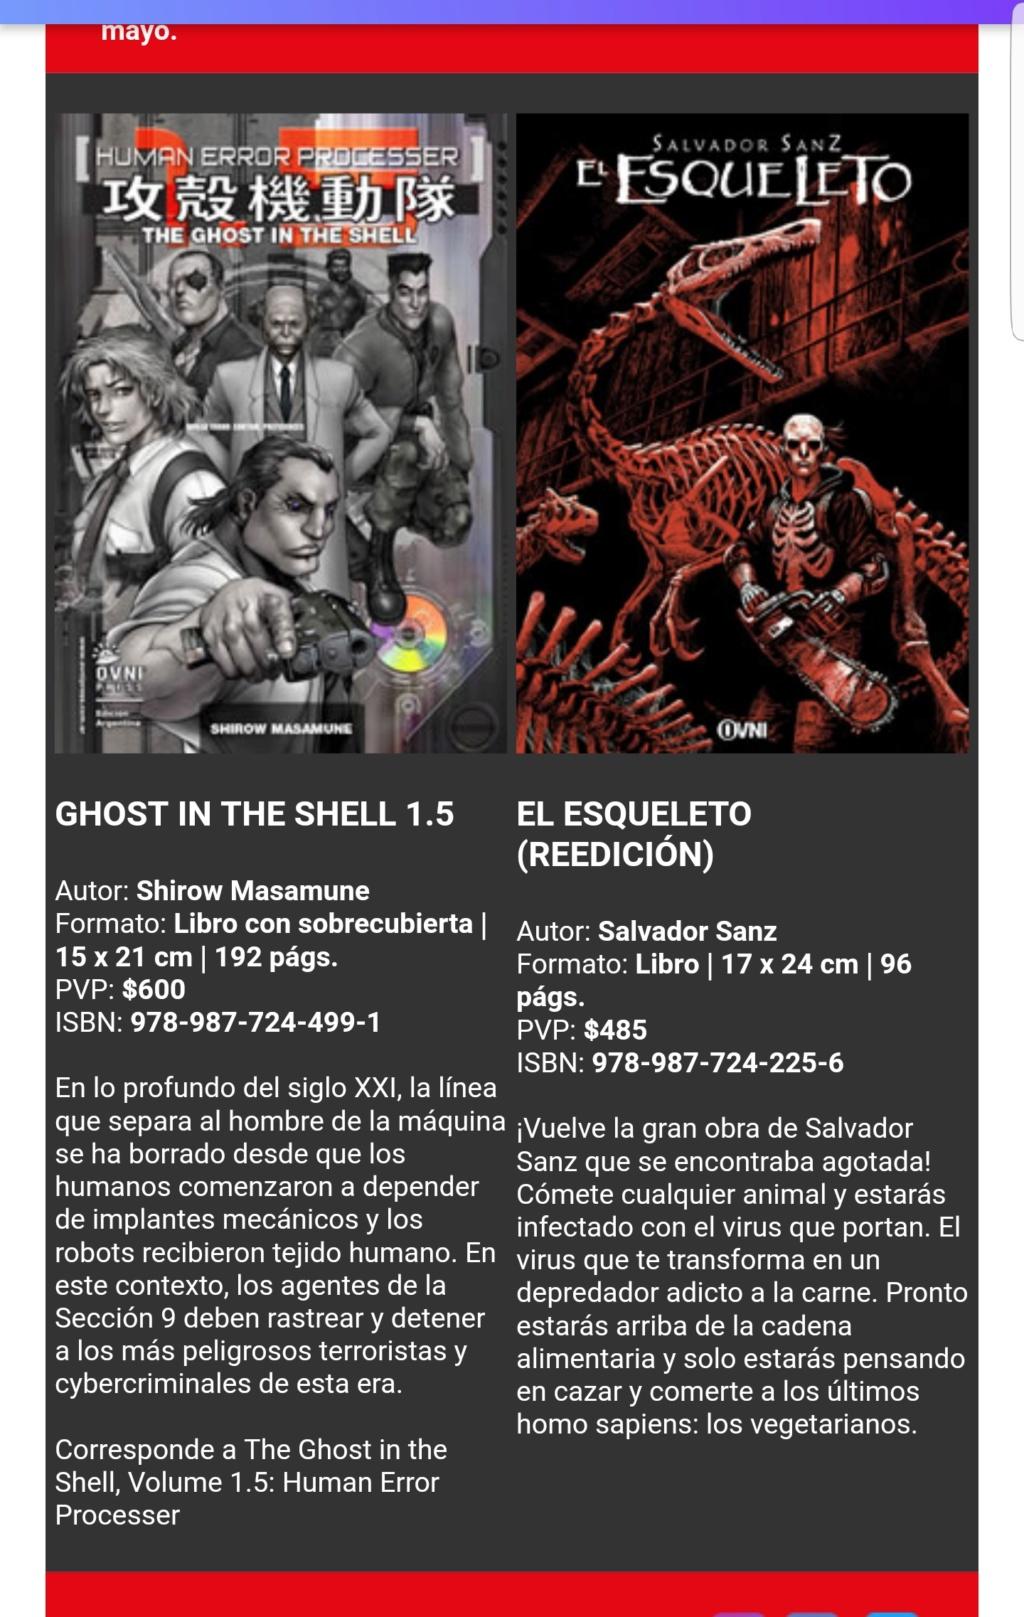 [Marvel - Ovni-Press] Consultas y novedades - Referente: Skyman v2 - Página 12 Screen12